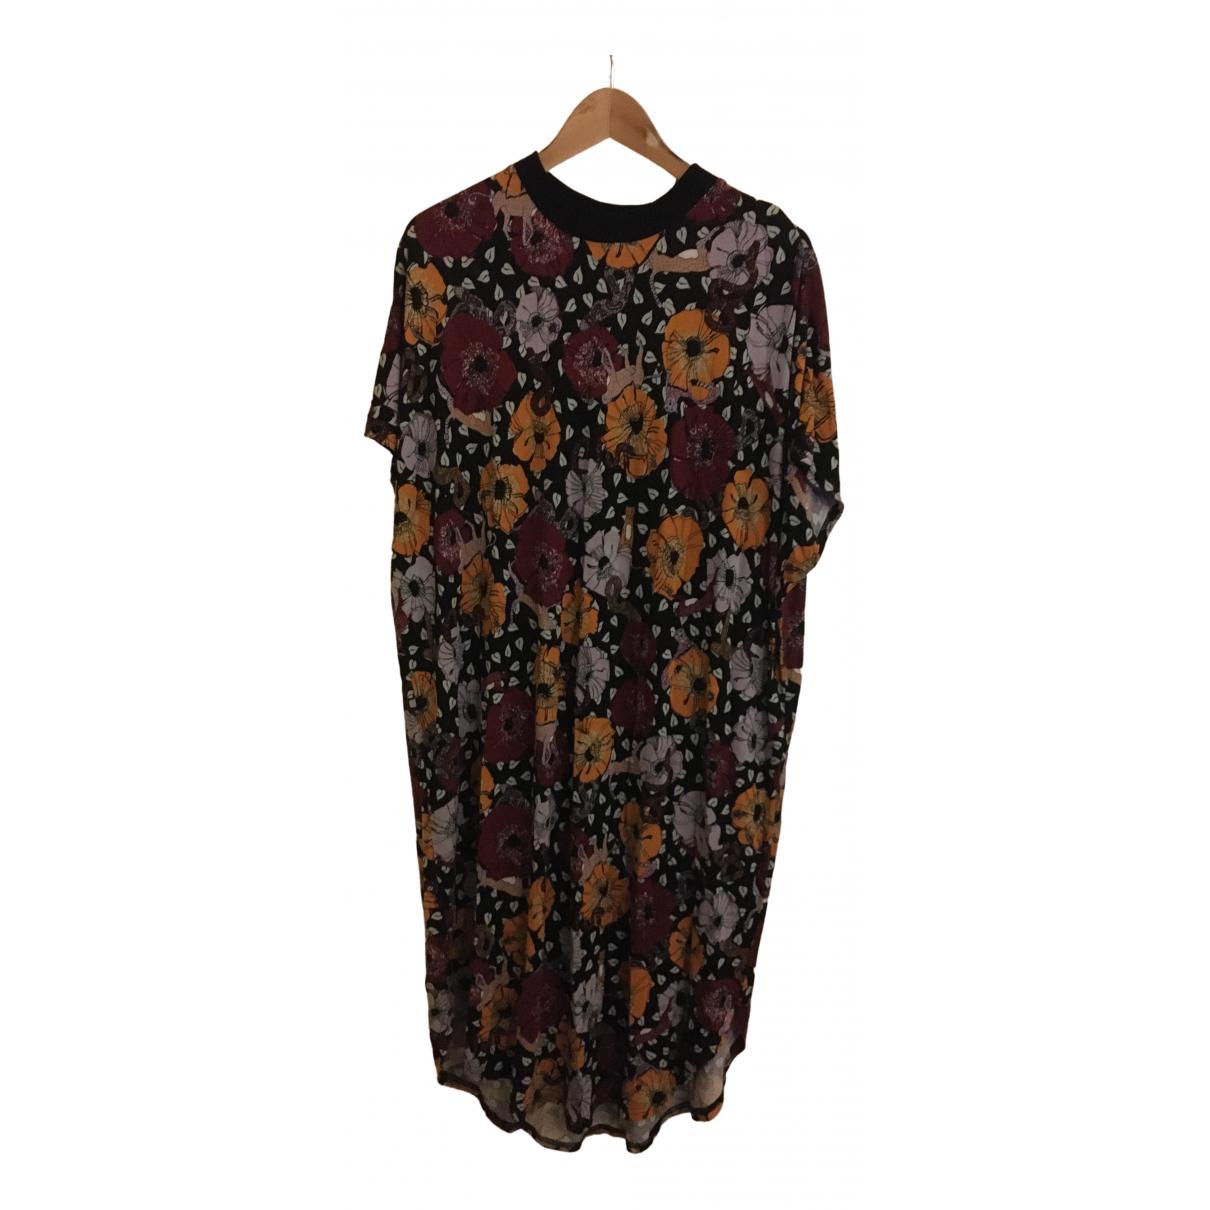 Monki \N Multicolour Cotton dress for Women XS International